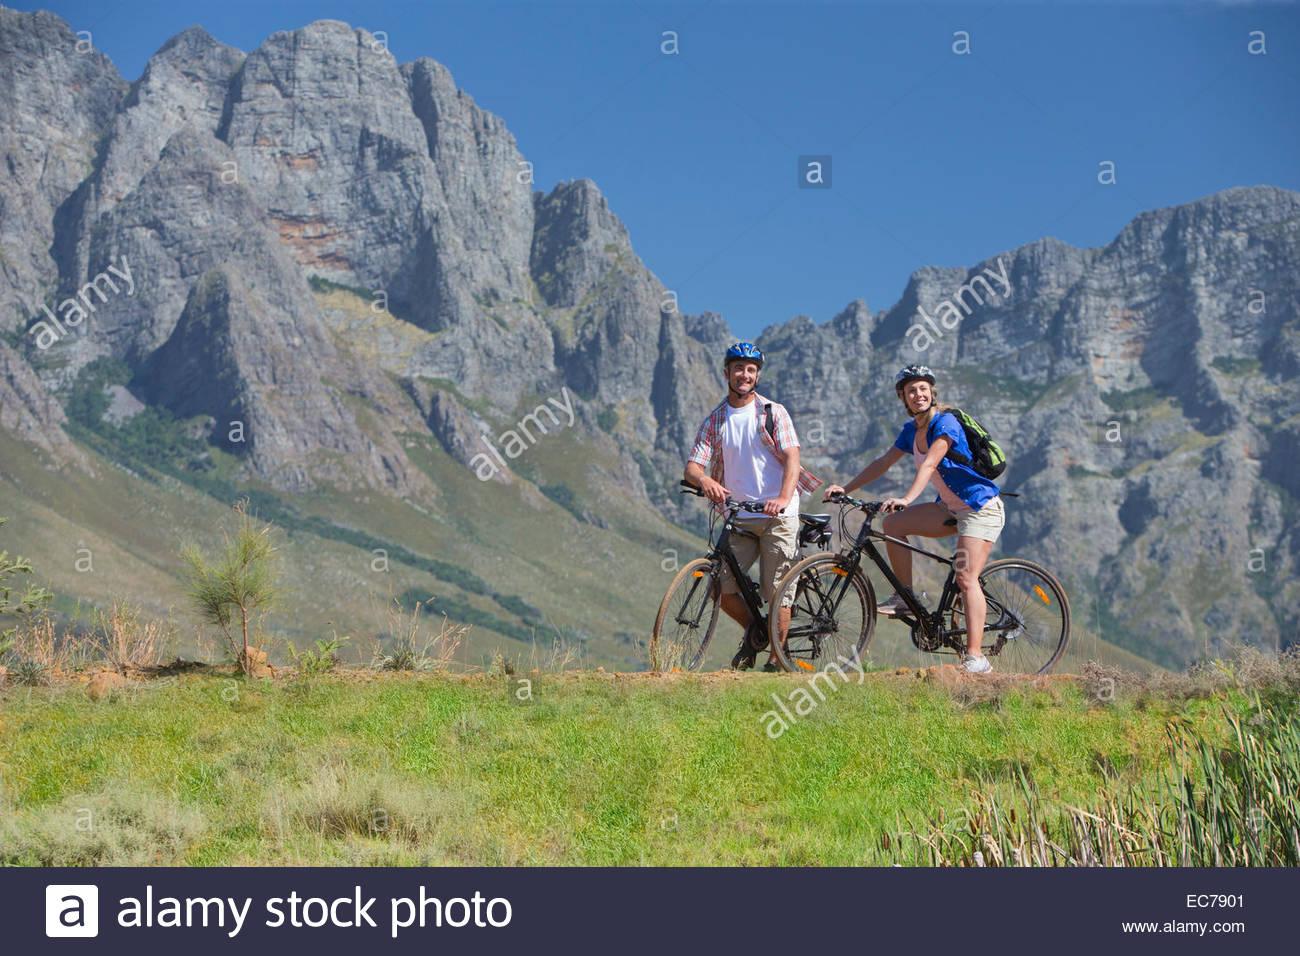 Par de ciclismo en pista de montaña Imagen De Stock